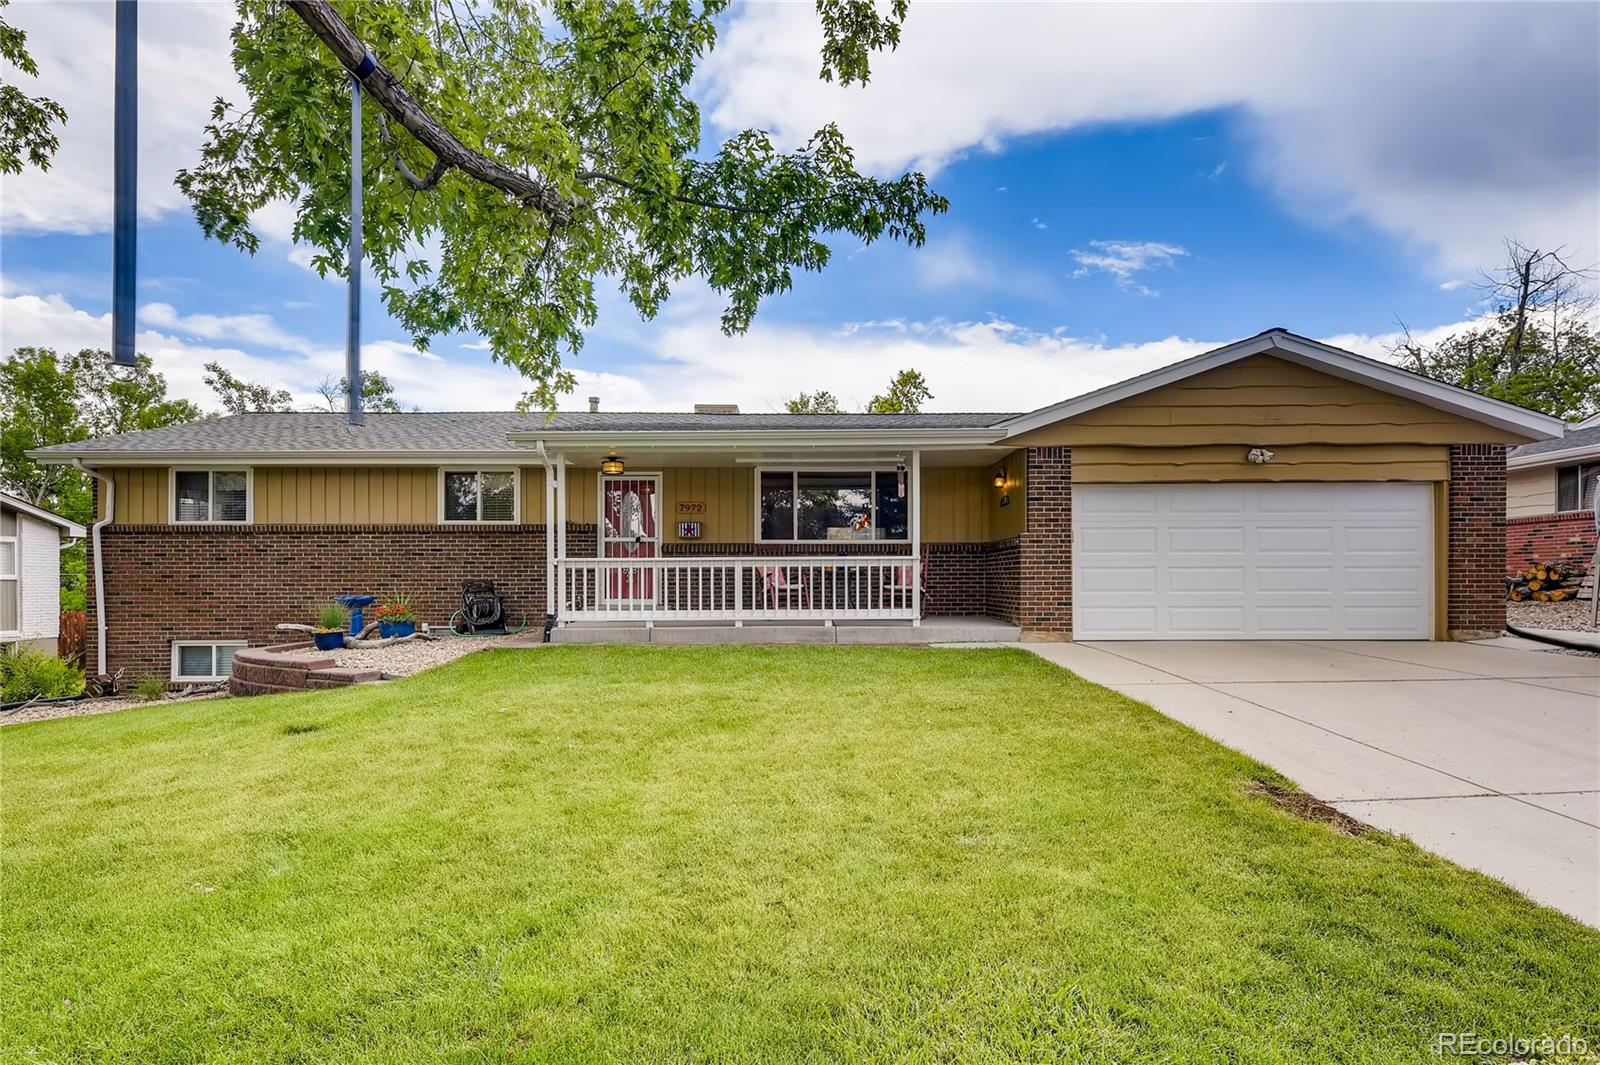 7972 S Jay Drive Property Photo - Littleton, CO real estate listing